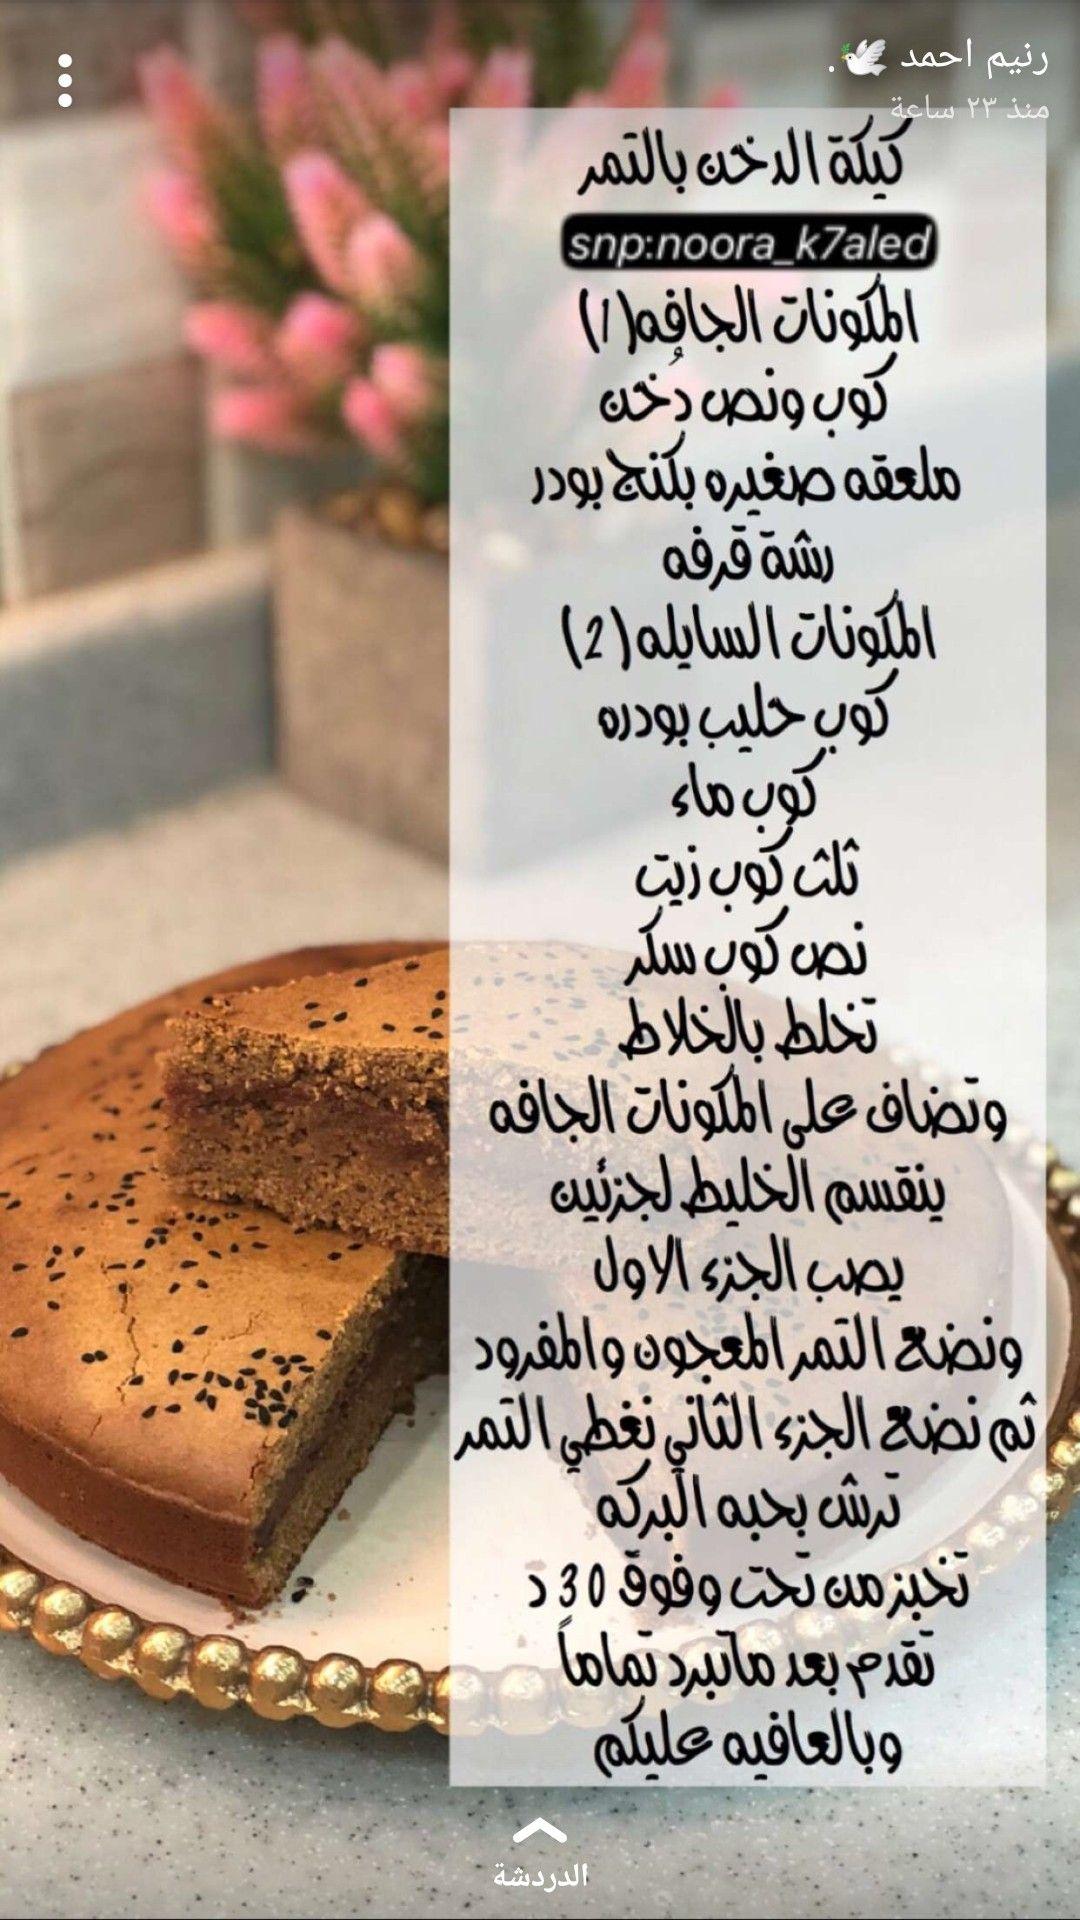 Pin By Zohoralreef On طبخات وضيافة عربية وعالمية Heathy Food Arabic Food Food